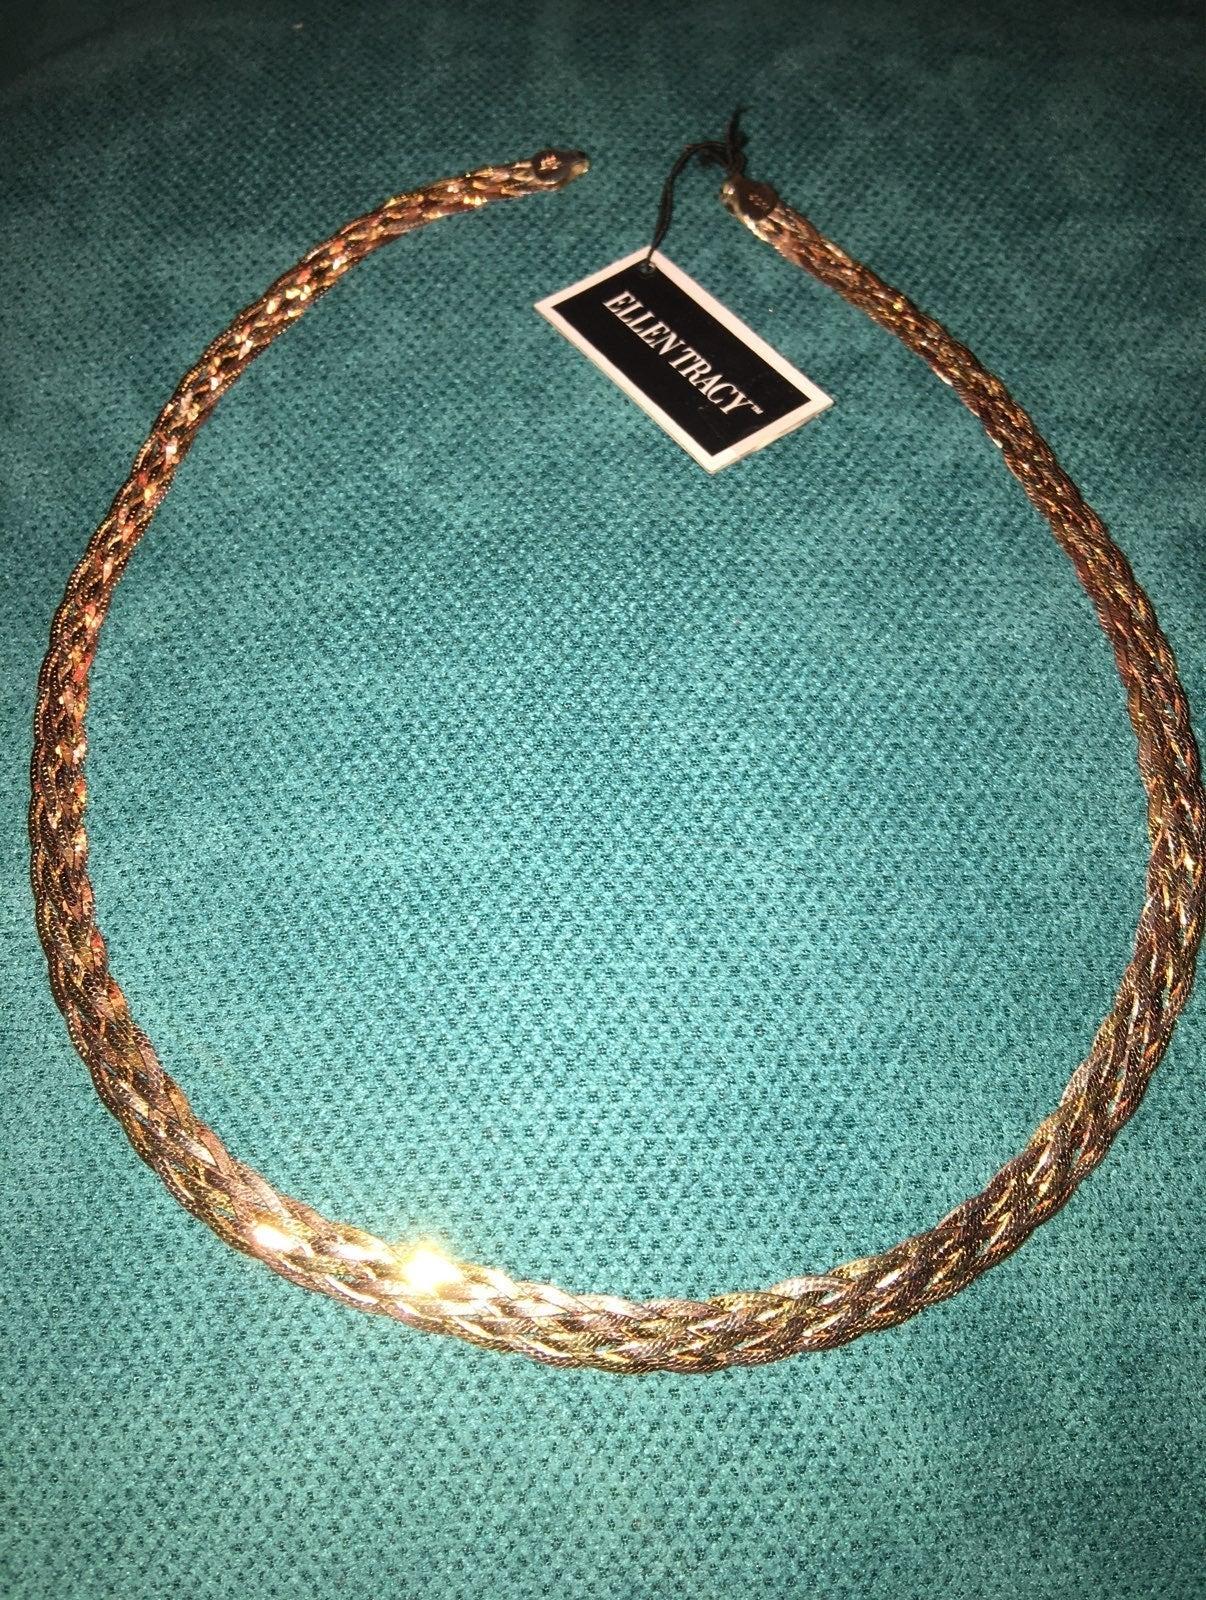 Sterling silver herringbone braided neck